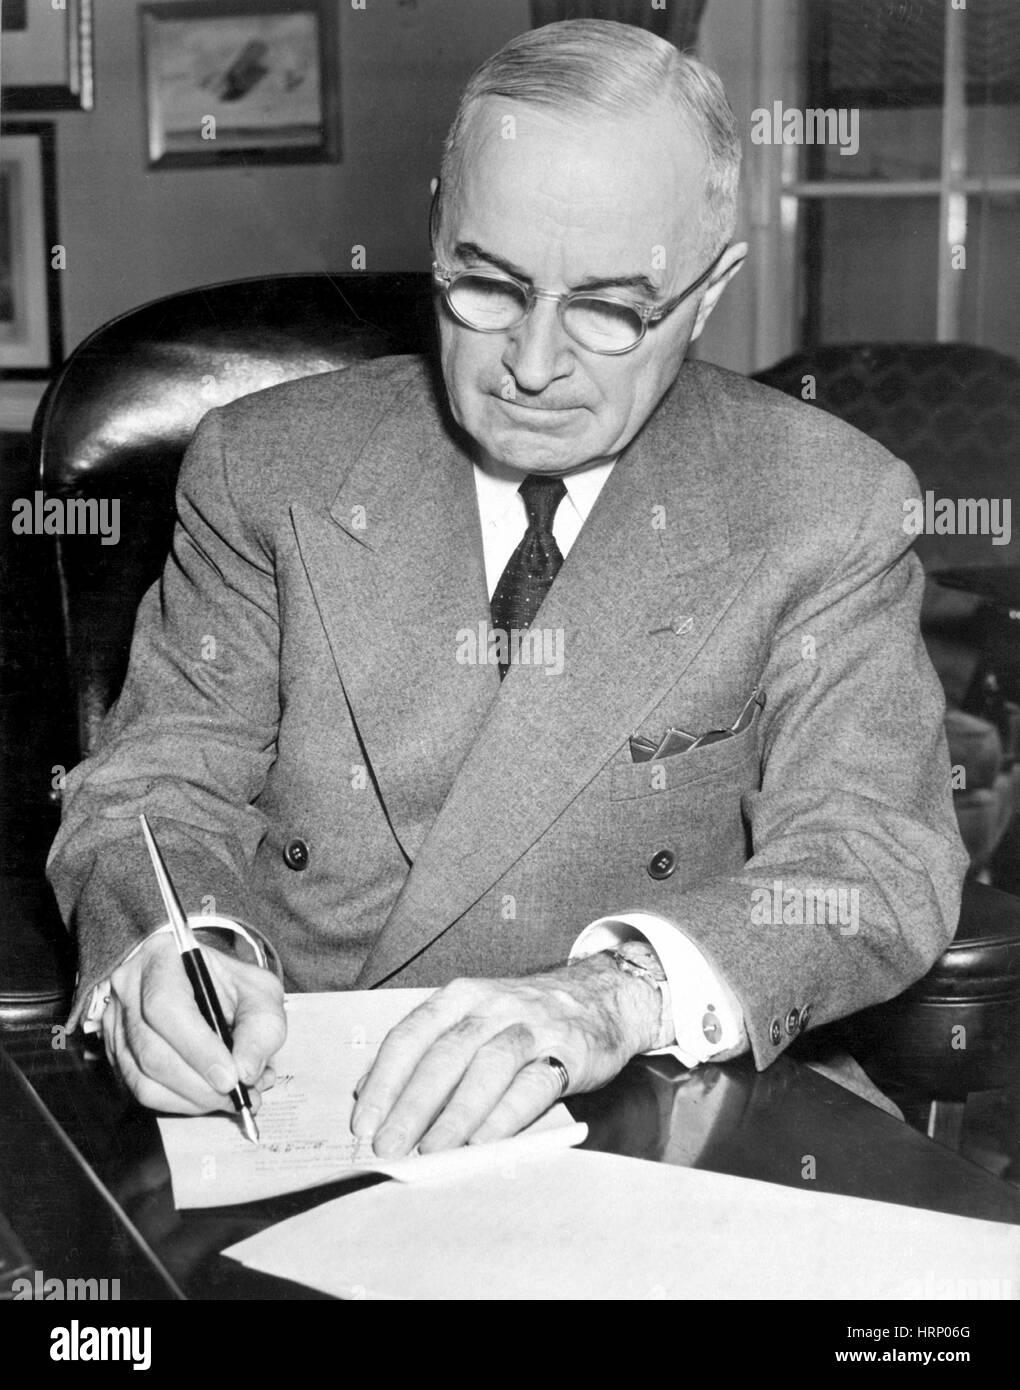 Truman Declares National Emergency, 1950 - Stock Image